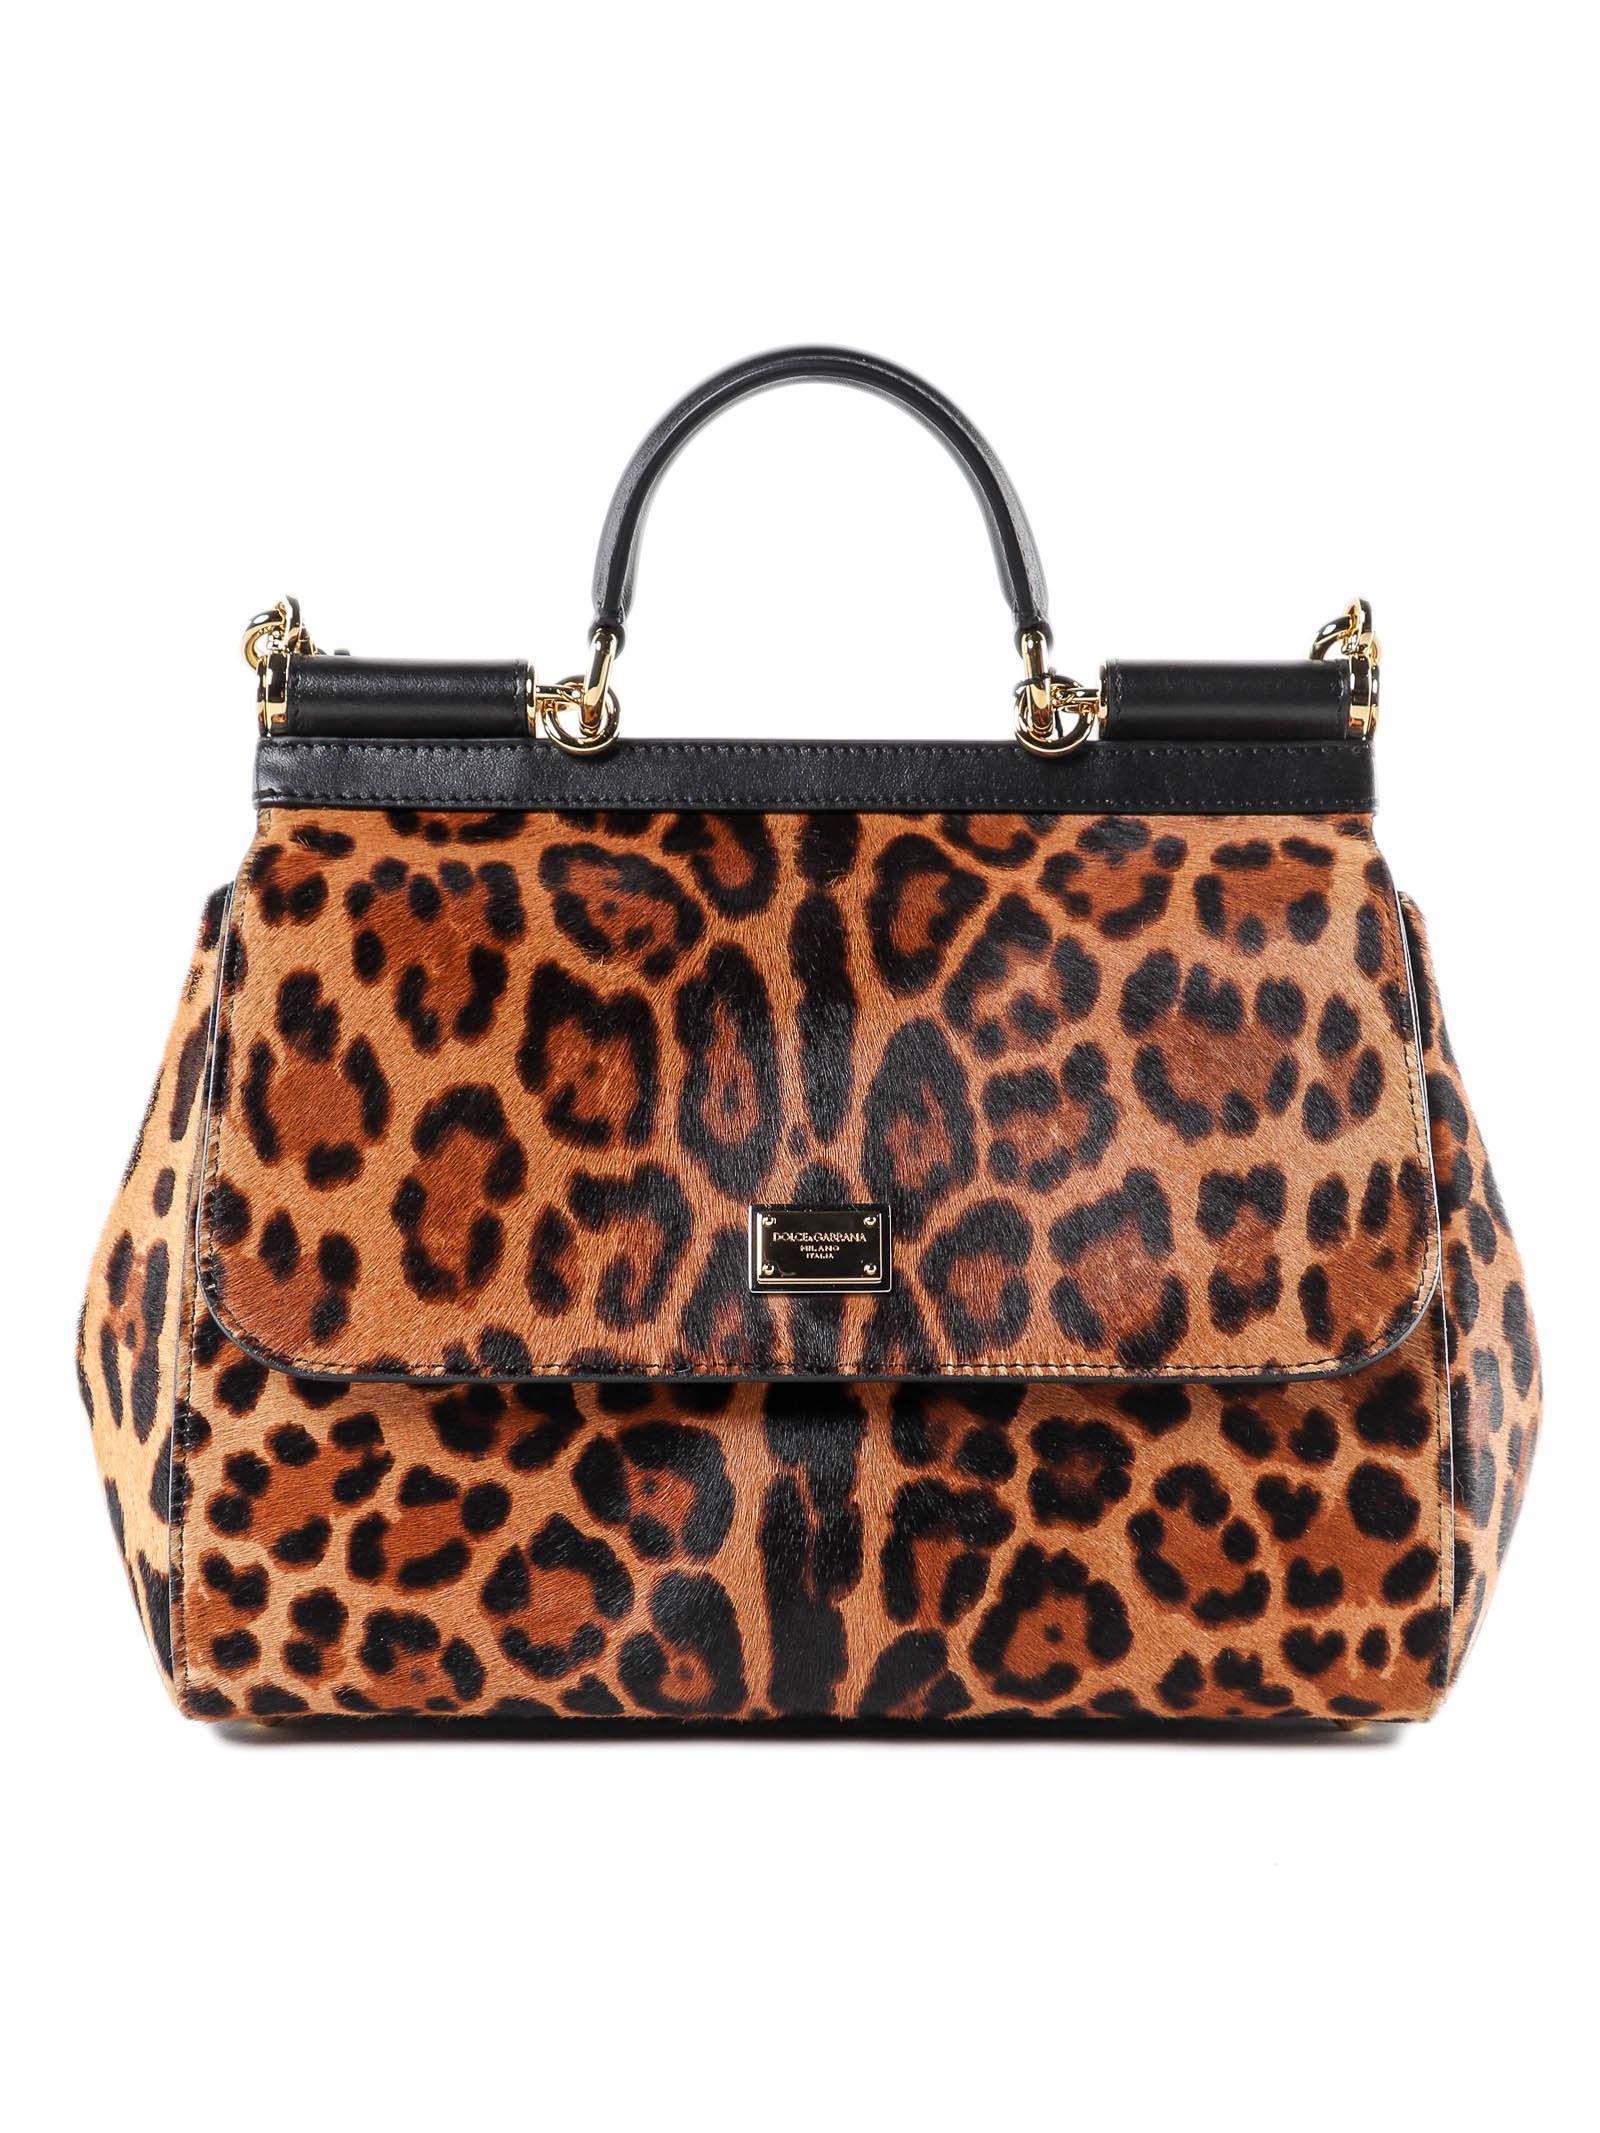 ccd425e88fa9 Dolce   Gabbana. Women s Pony Leo Handbag